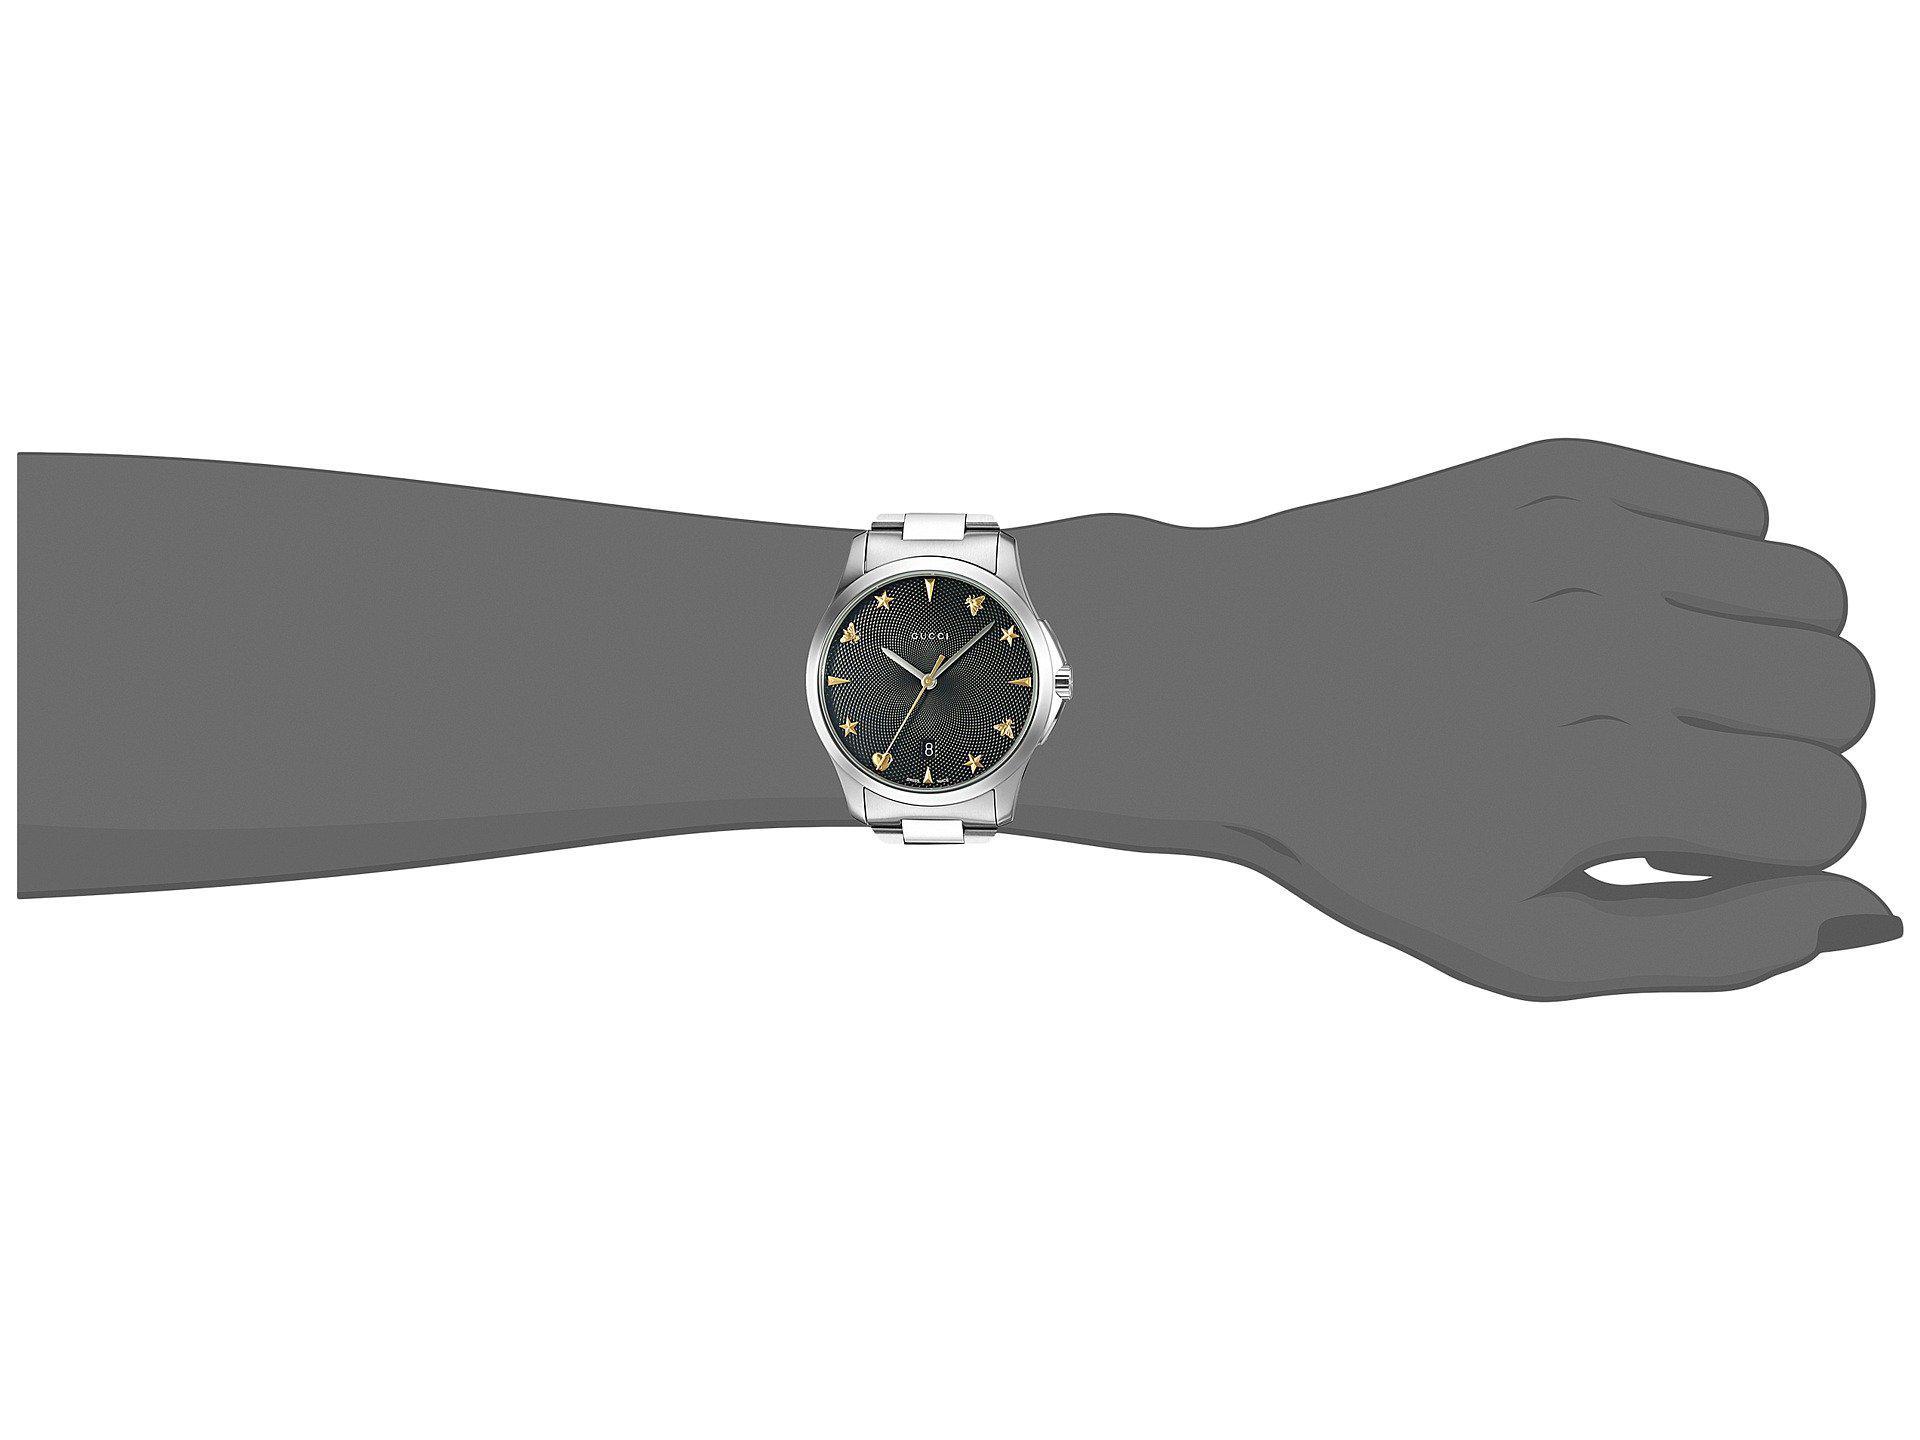 d0eed5441db Lyst - Gucci G-timeless - Ya1264029 in Metallic